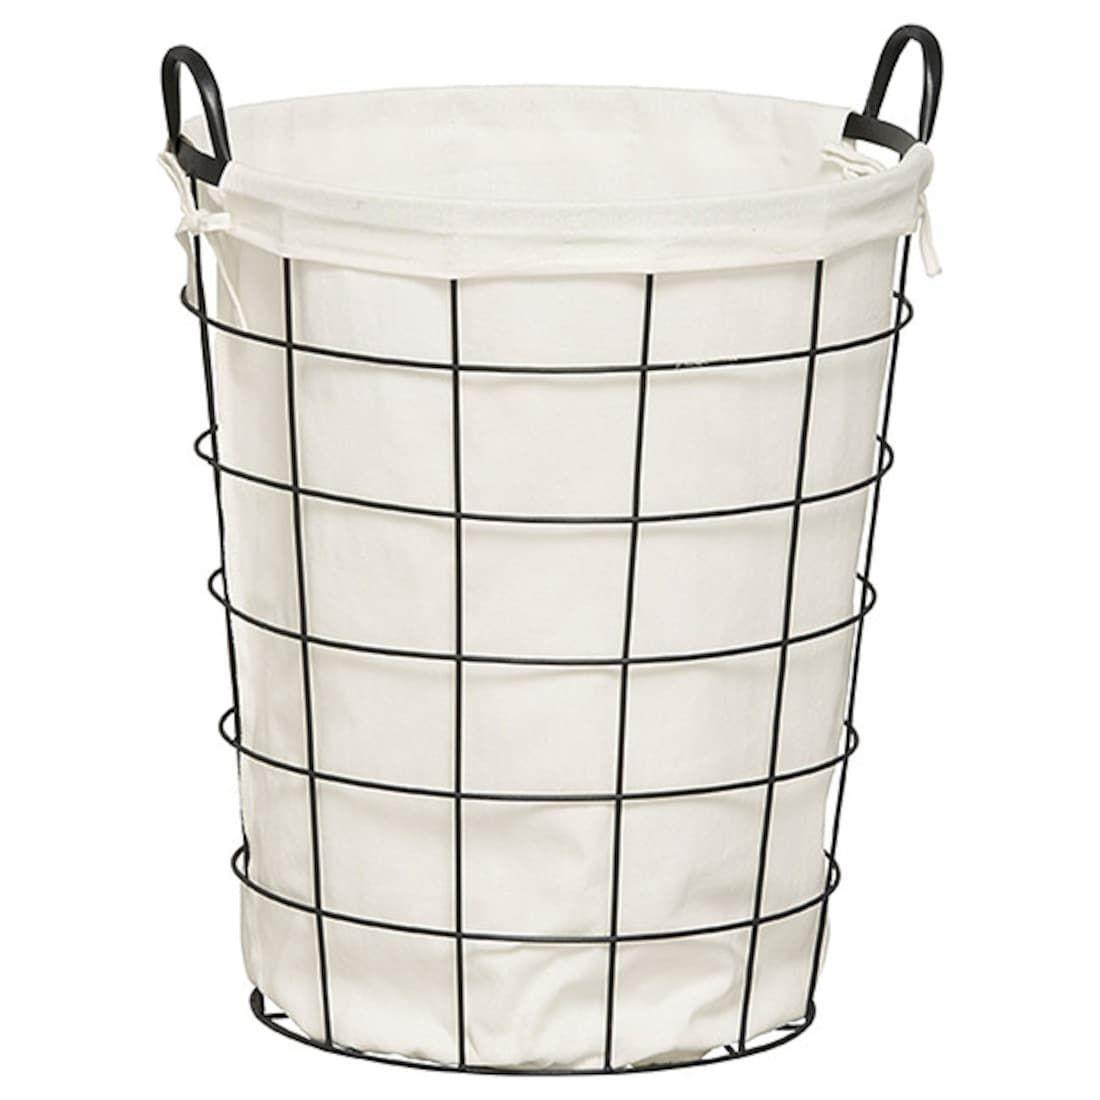 Metal Laundry Hamper Black Laundry Hamper Metal Laundry Basket Target Laundry Basket